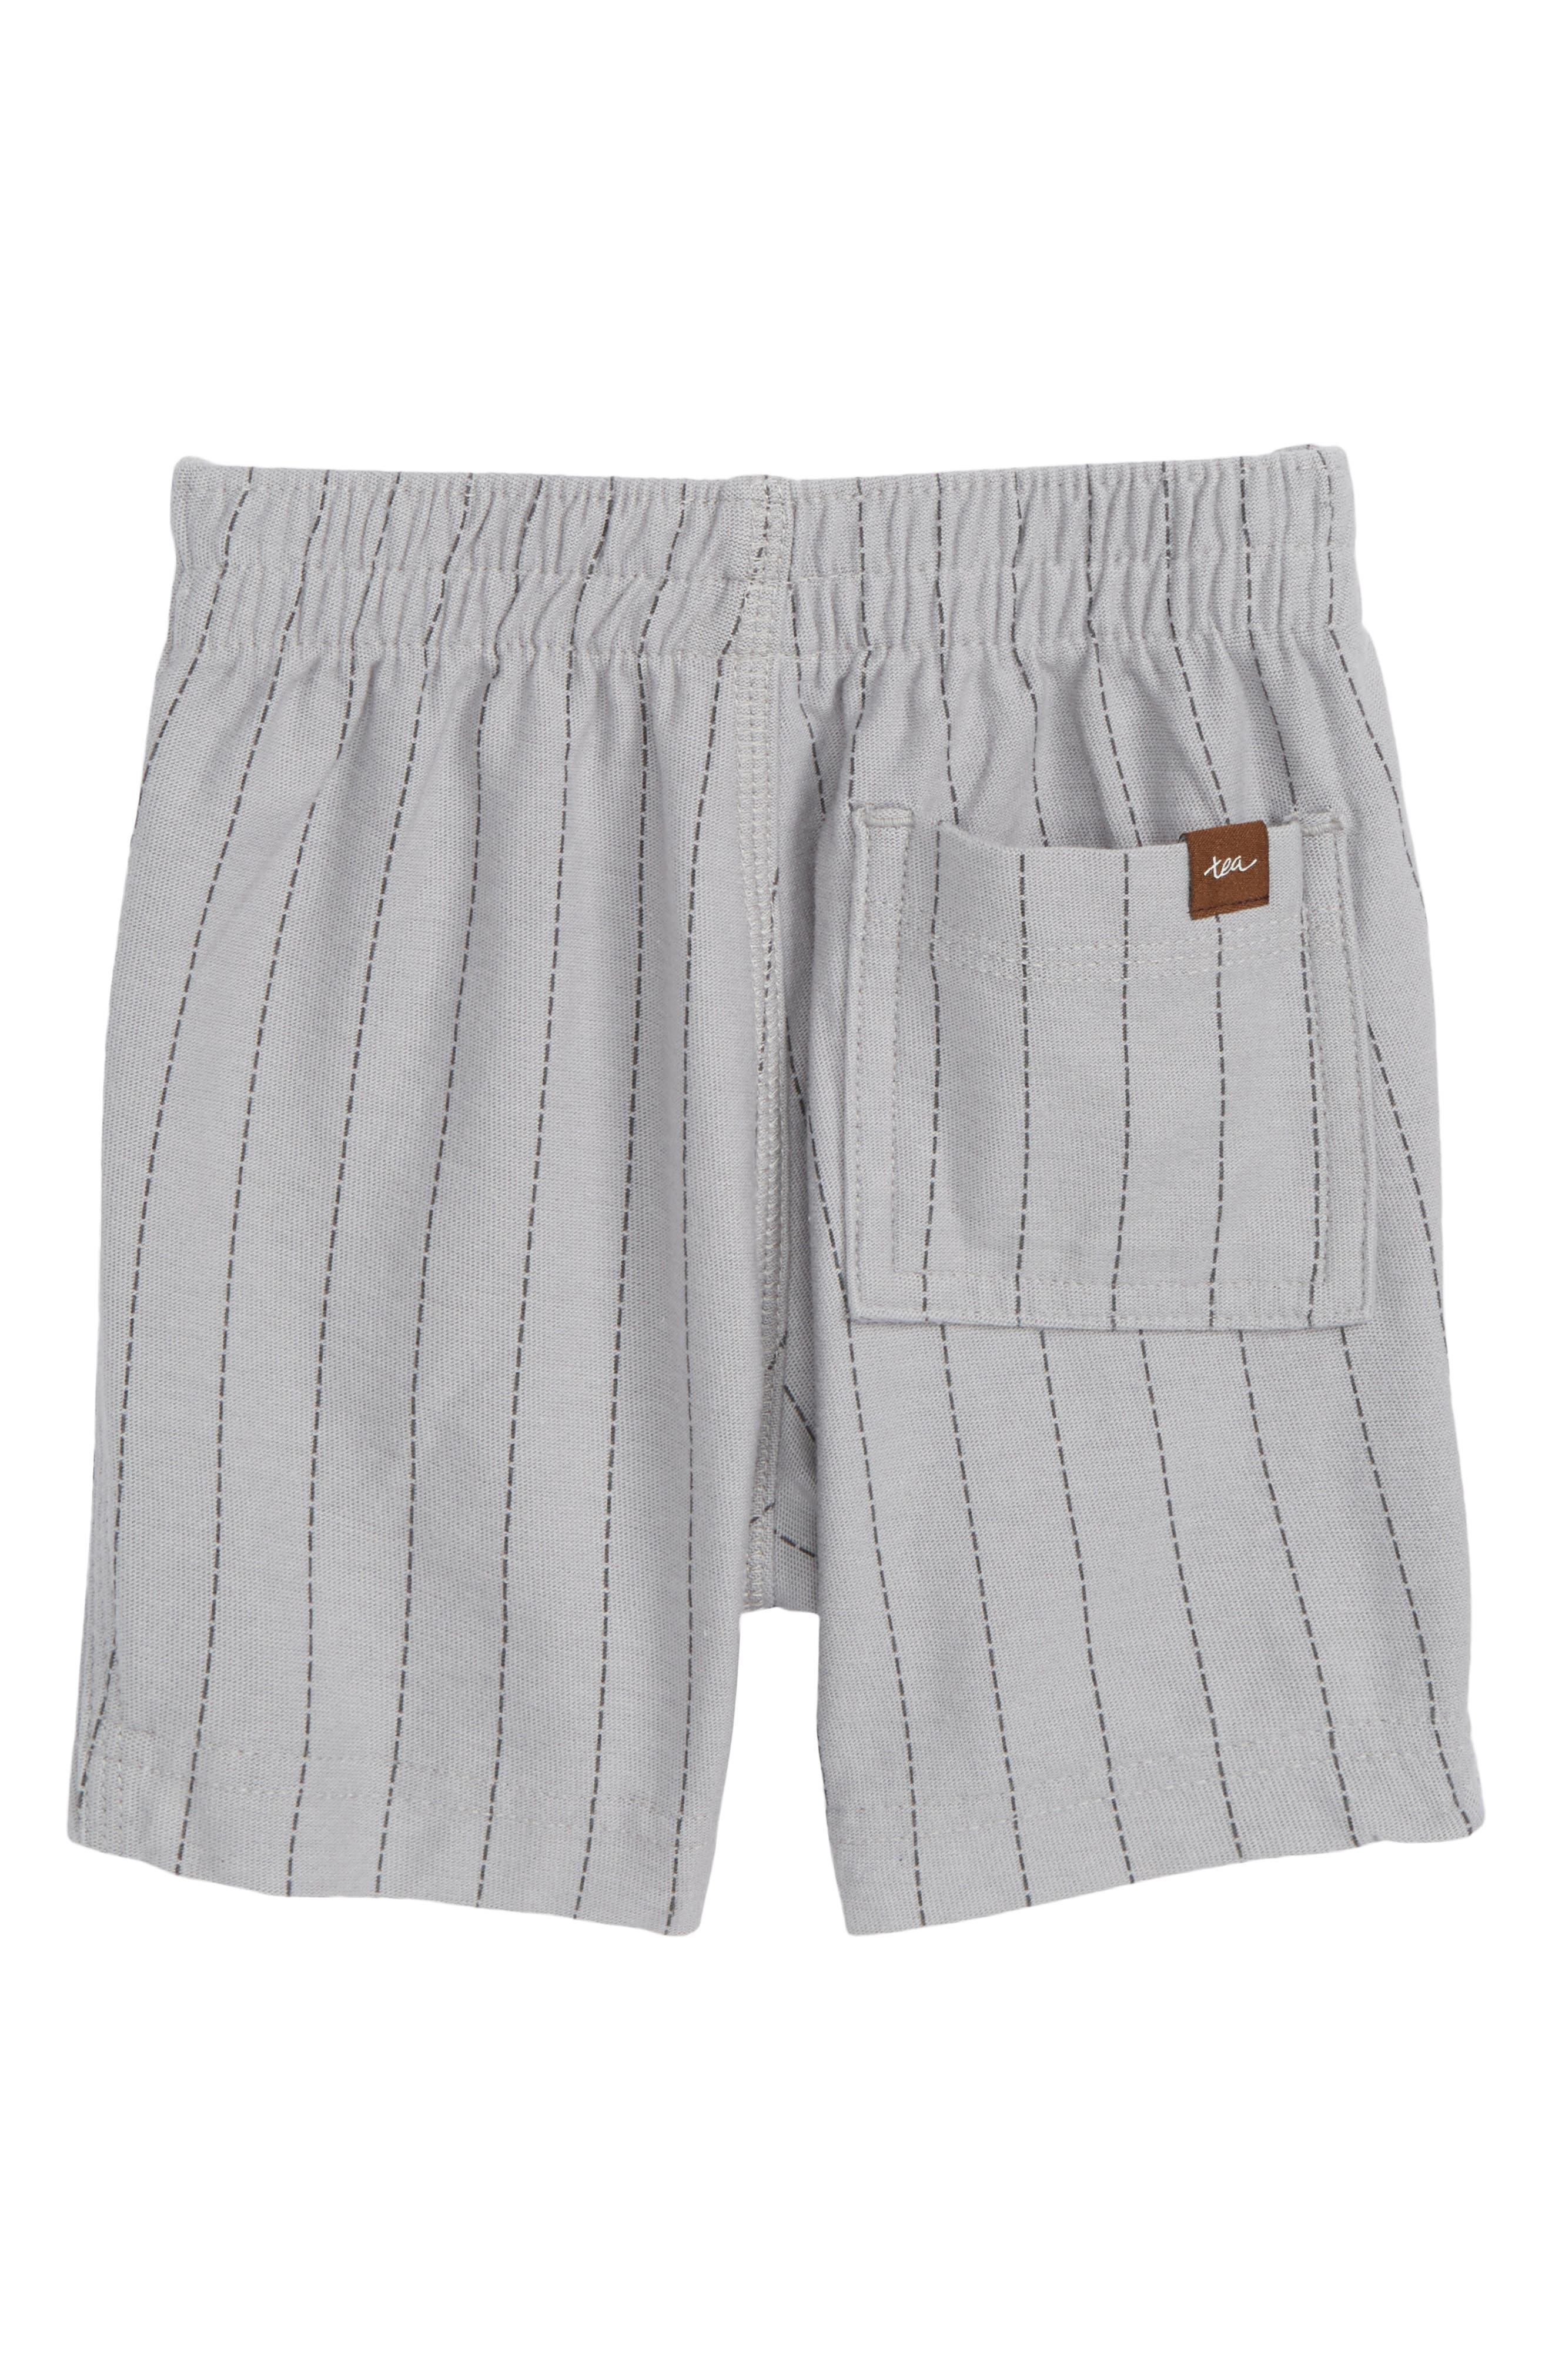 Stripe Shorts,                             Alternate thumbnail 2, color,                             Storm Grey Ticking Stripe